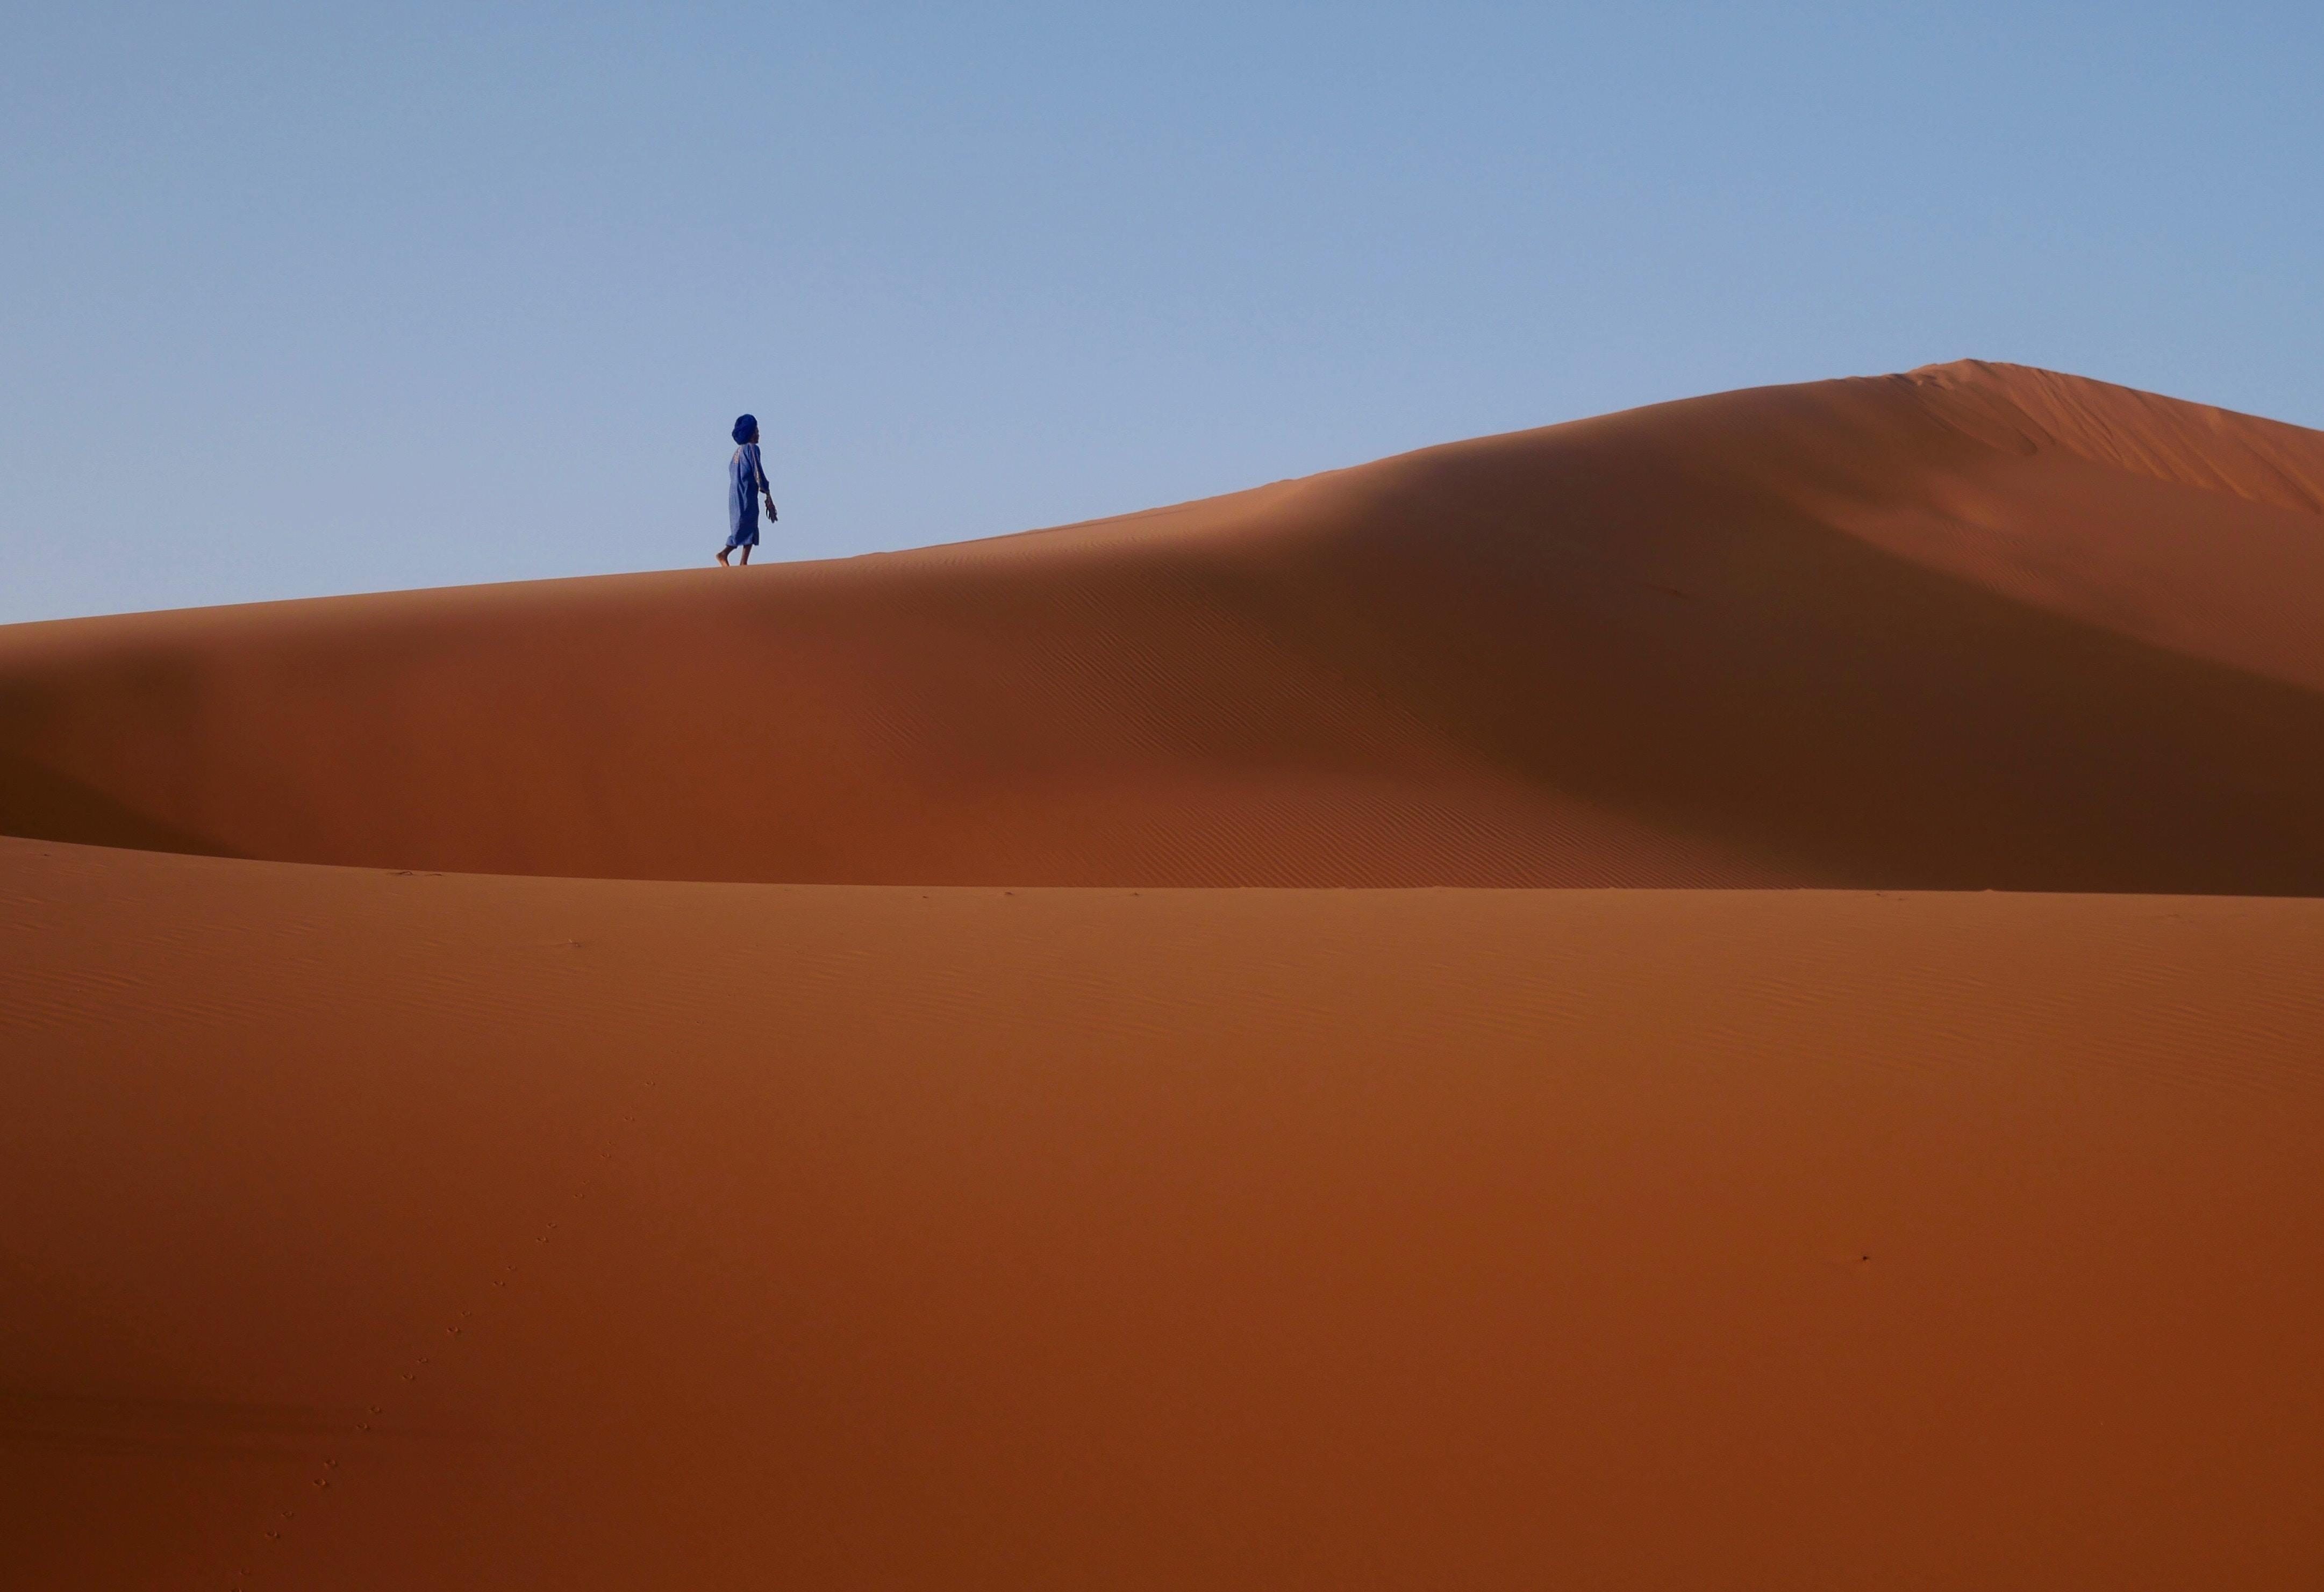 silhouette of person walking on desert